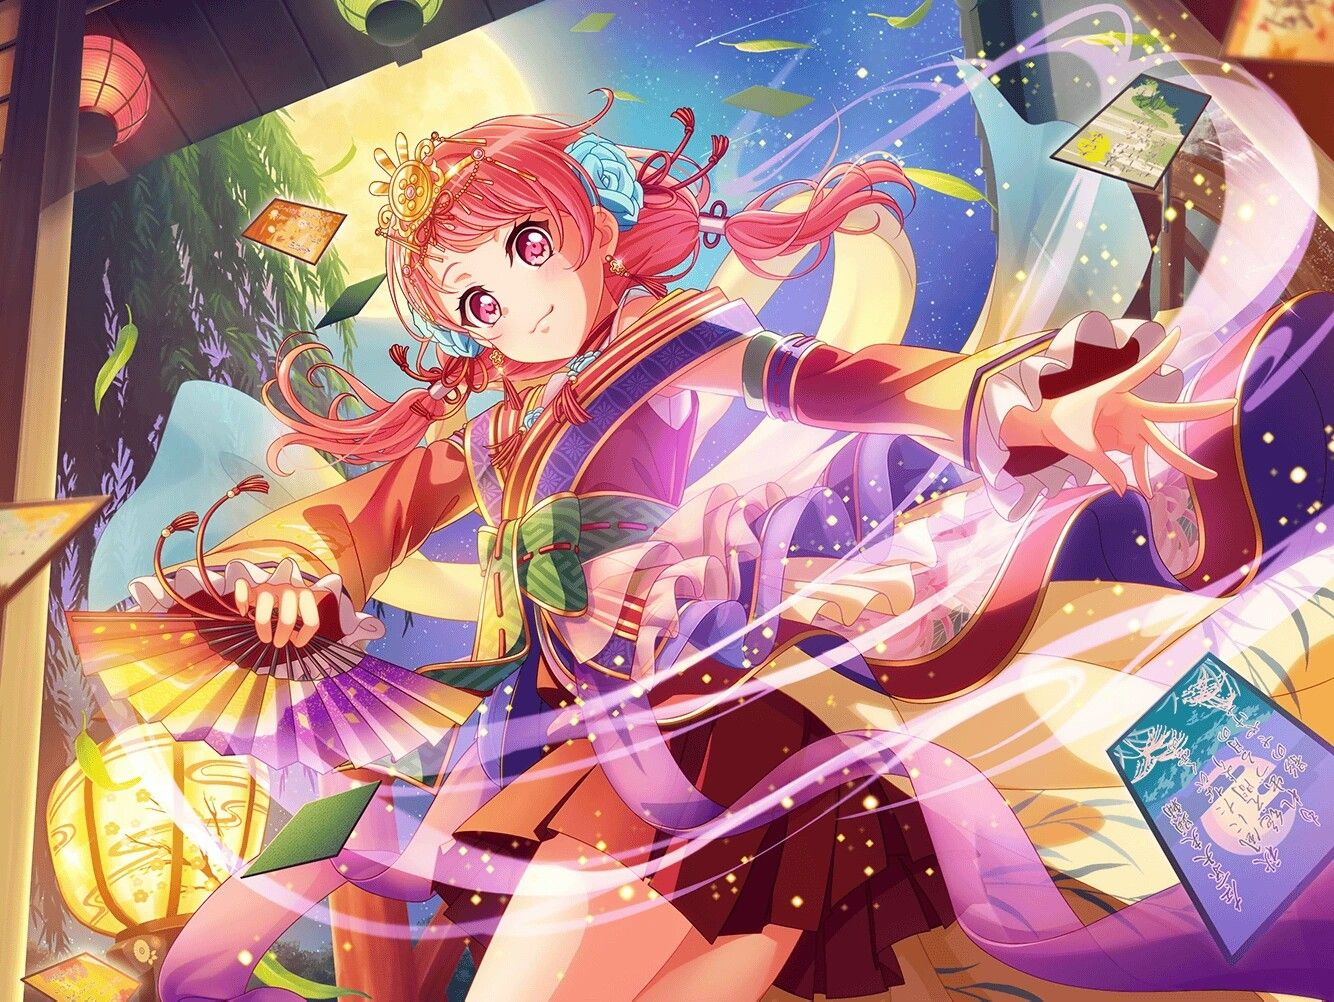 641 Aya Anime Music Hot Anime Boy Anime